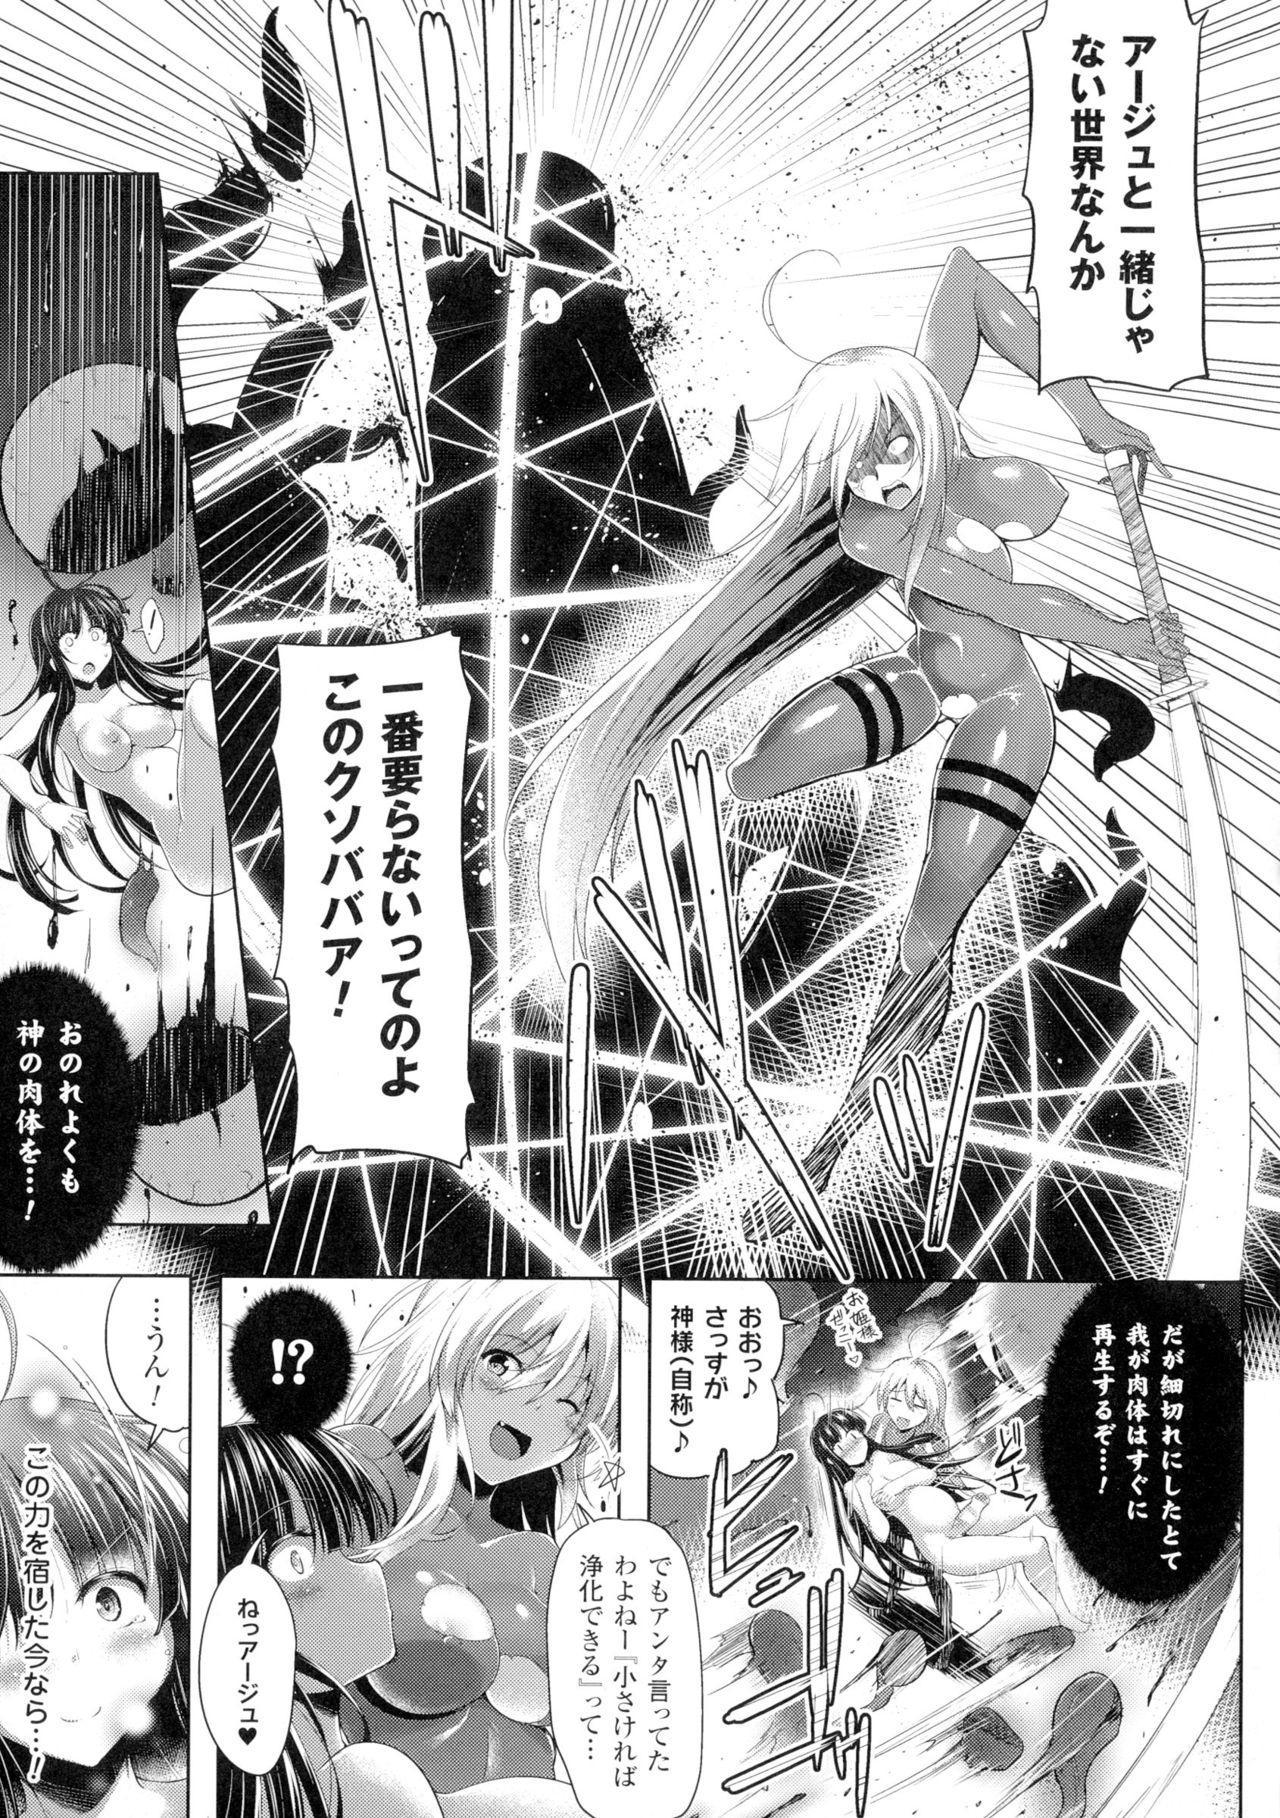 Seigi no Heroine Kangoku File DX Vol. 1 116